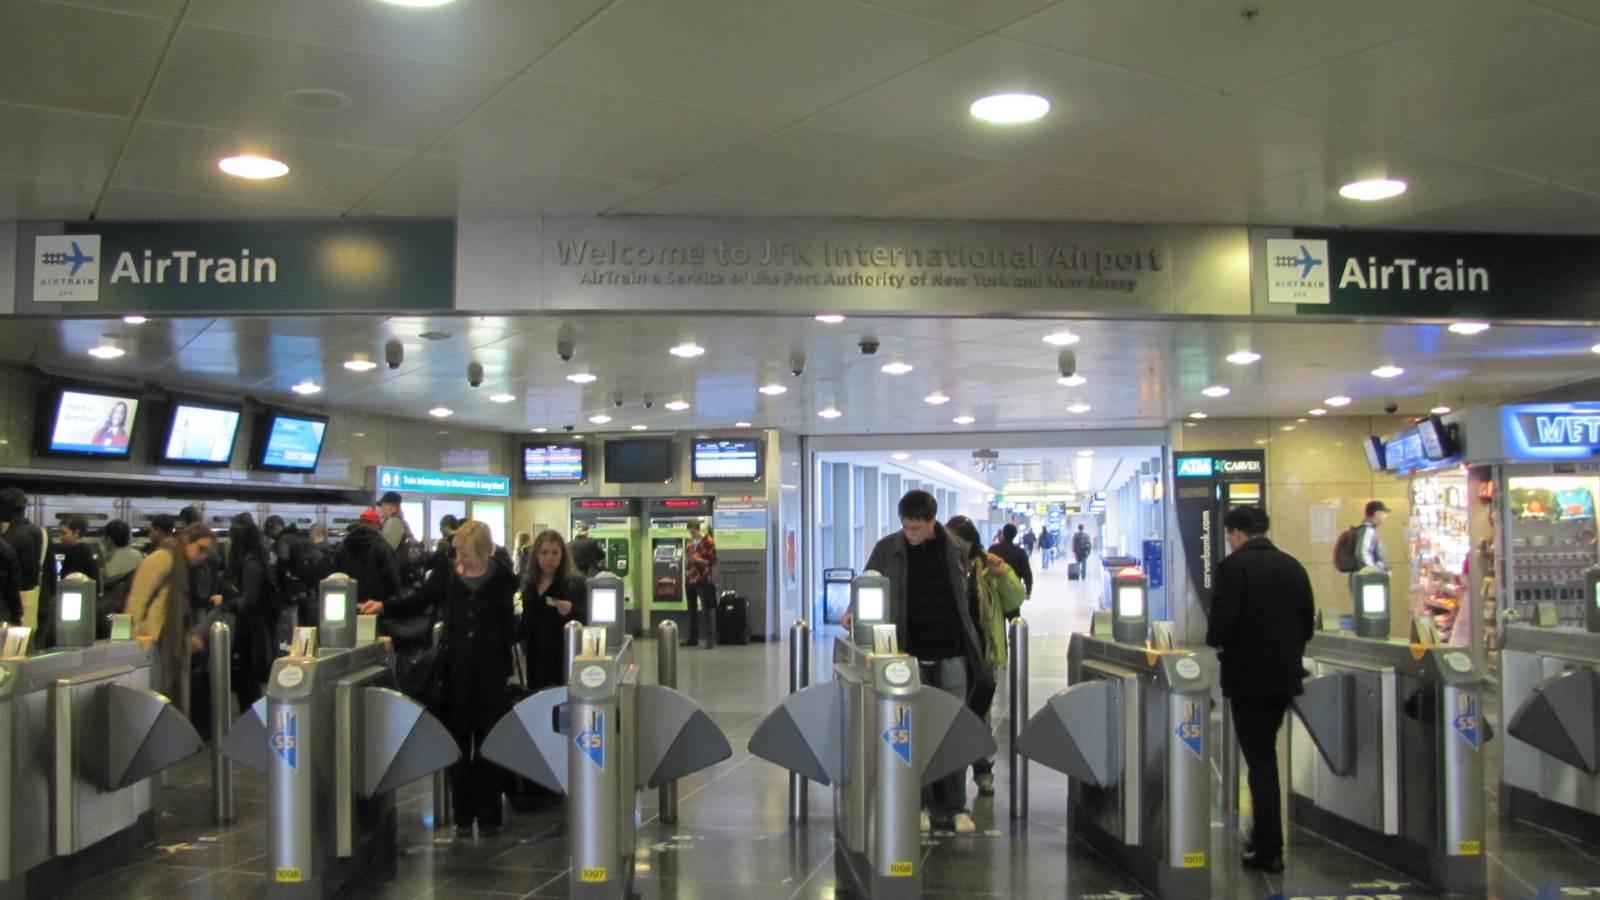 Aeroporto Jfk : Da per j.f.kennedy airport jfk new york city usa